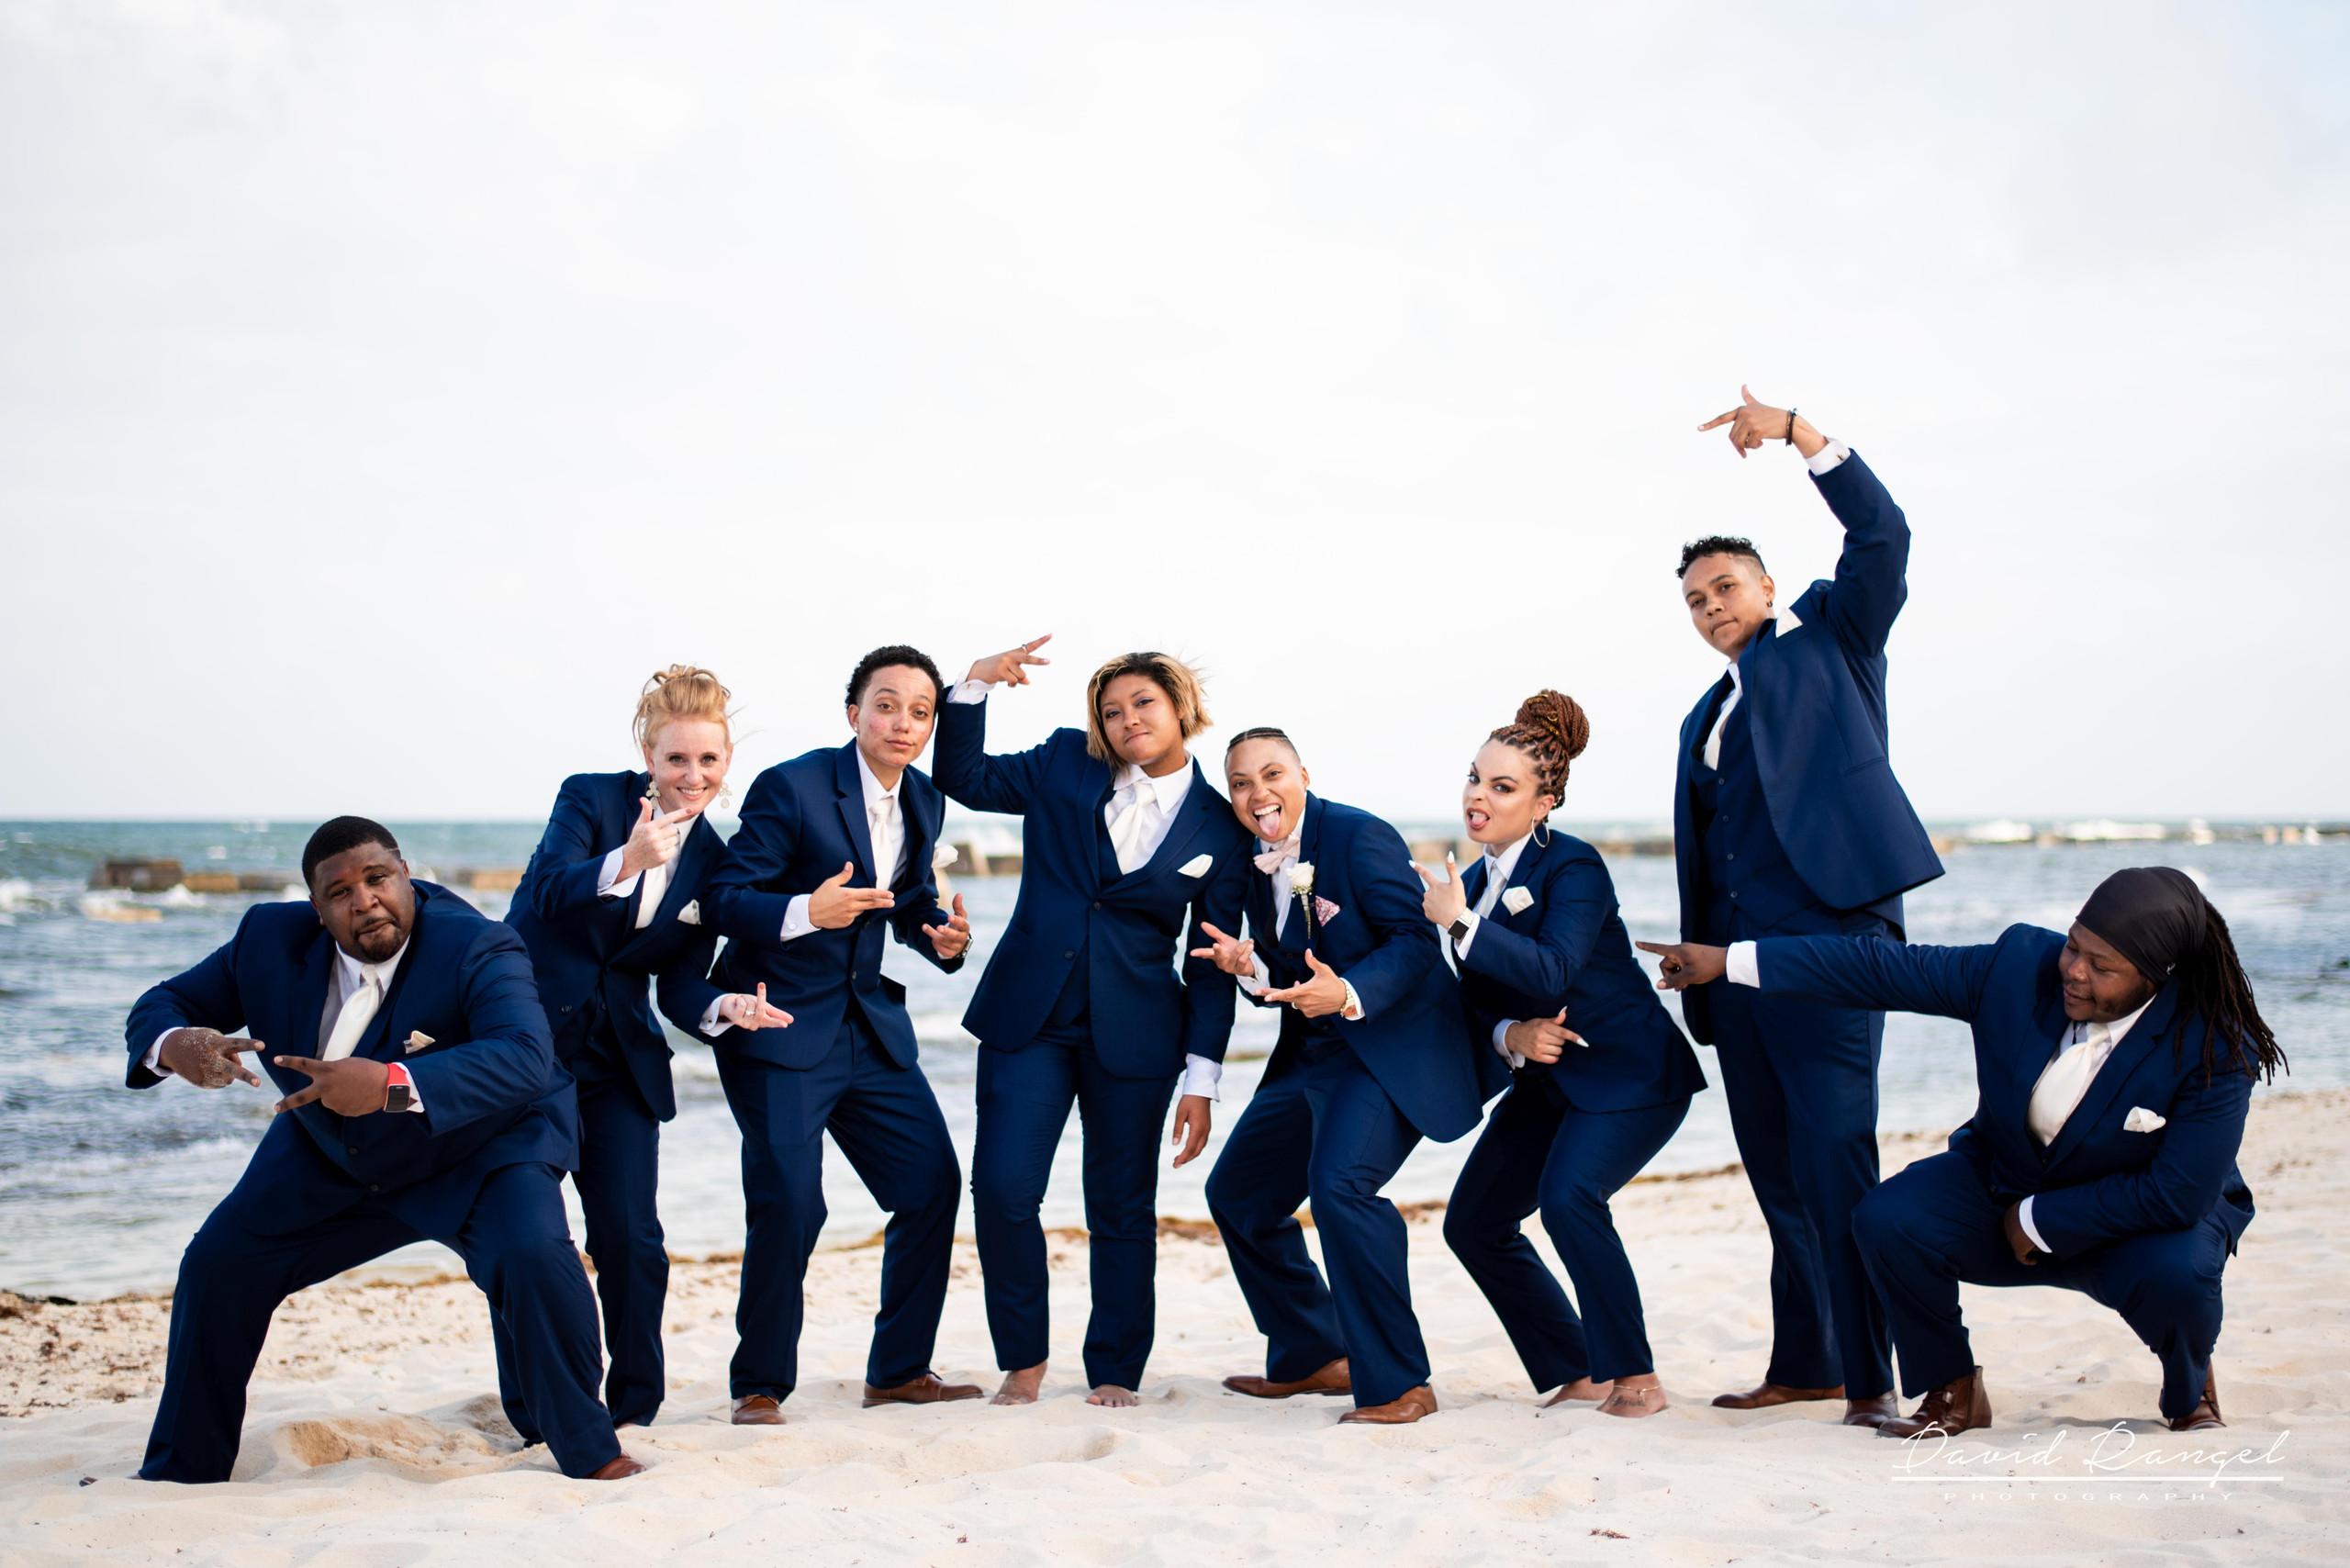 grooms+men+creu+beach